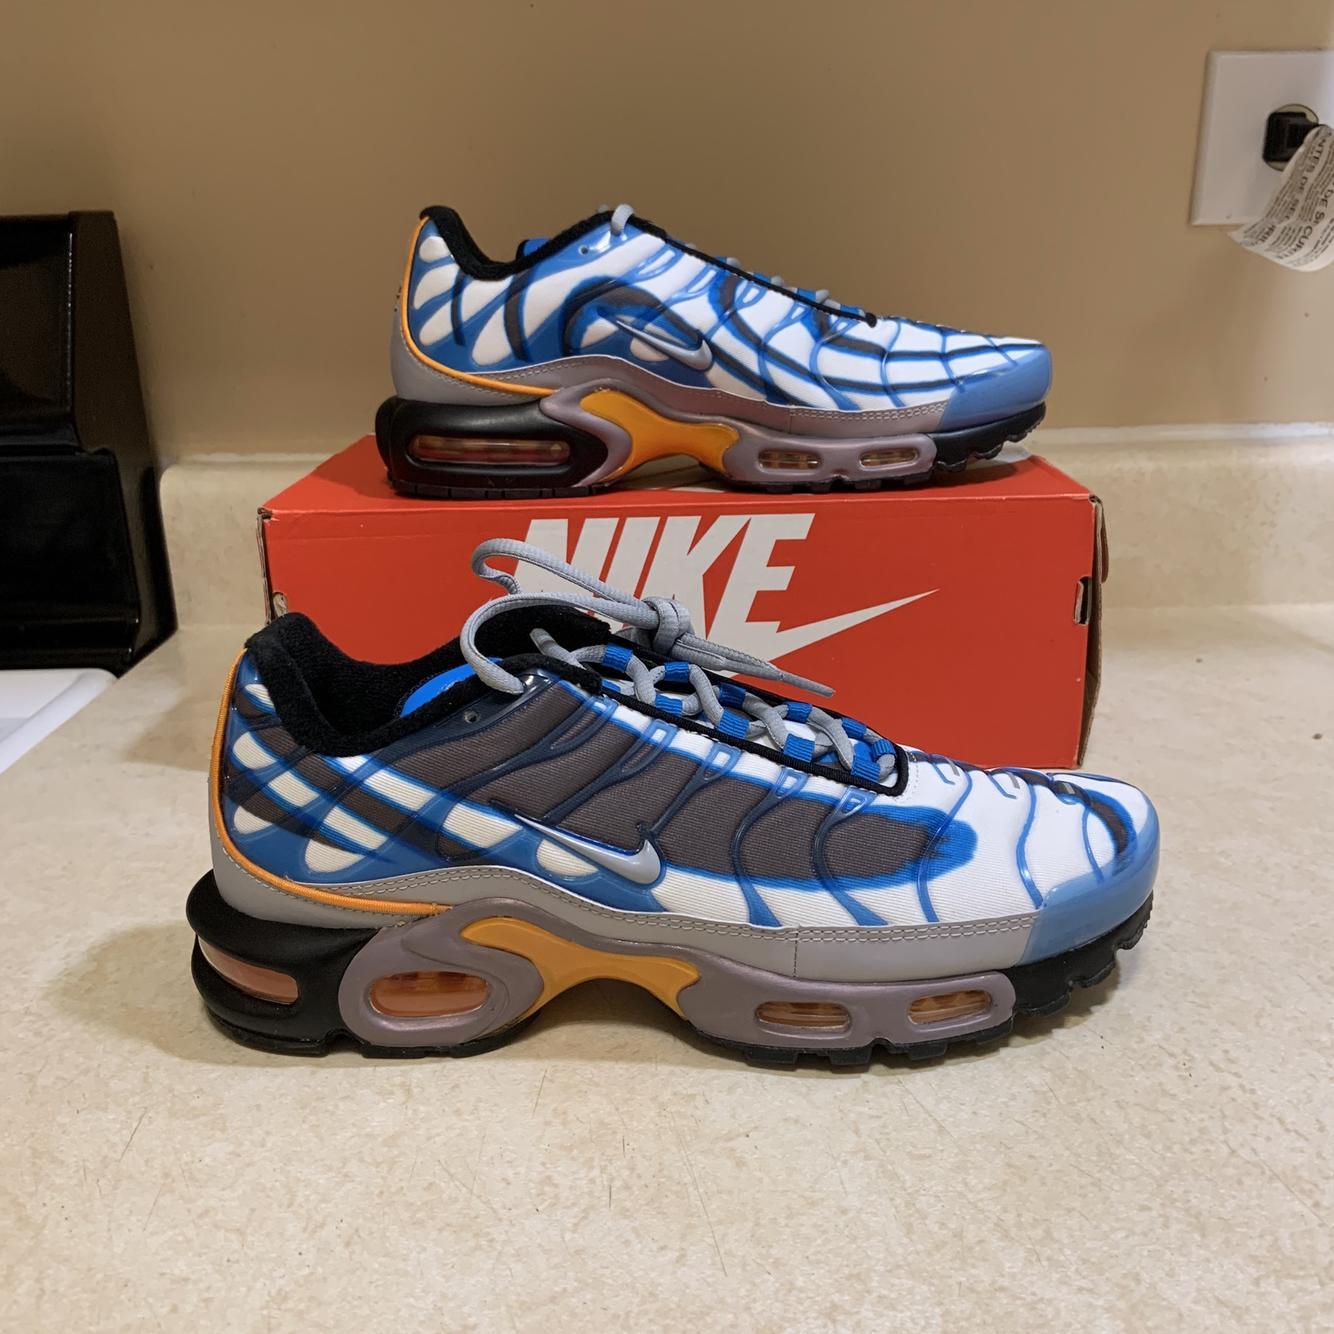 Nike Men's Air Max Plus Photo Blue Grey Orange 815994-400 Size 9.5 Retail  $170   Footwear Turfs, Indoor, Sneakers & Training